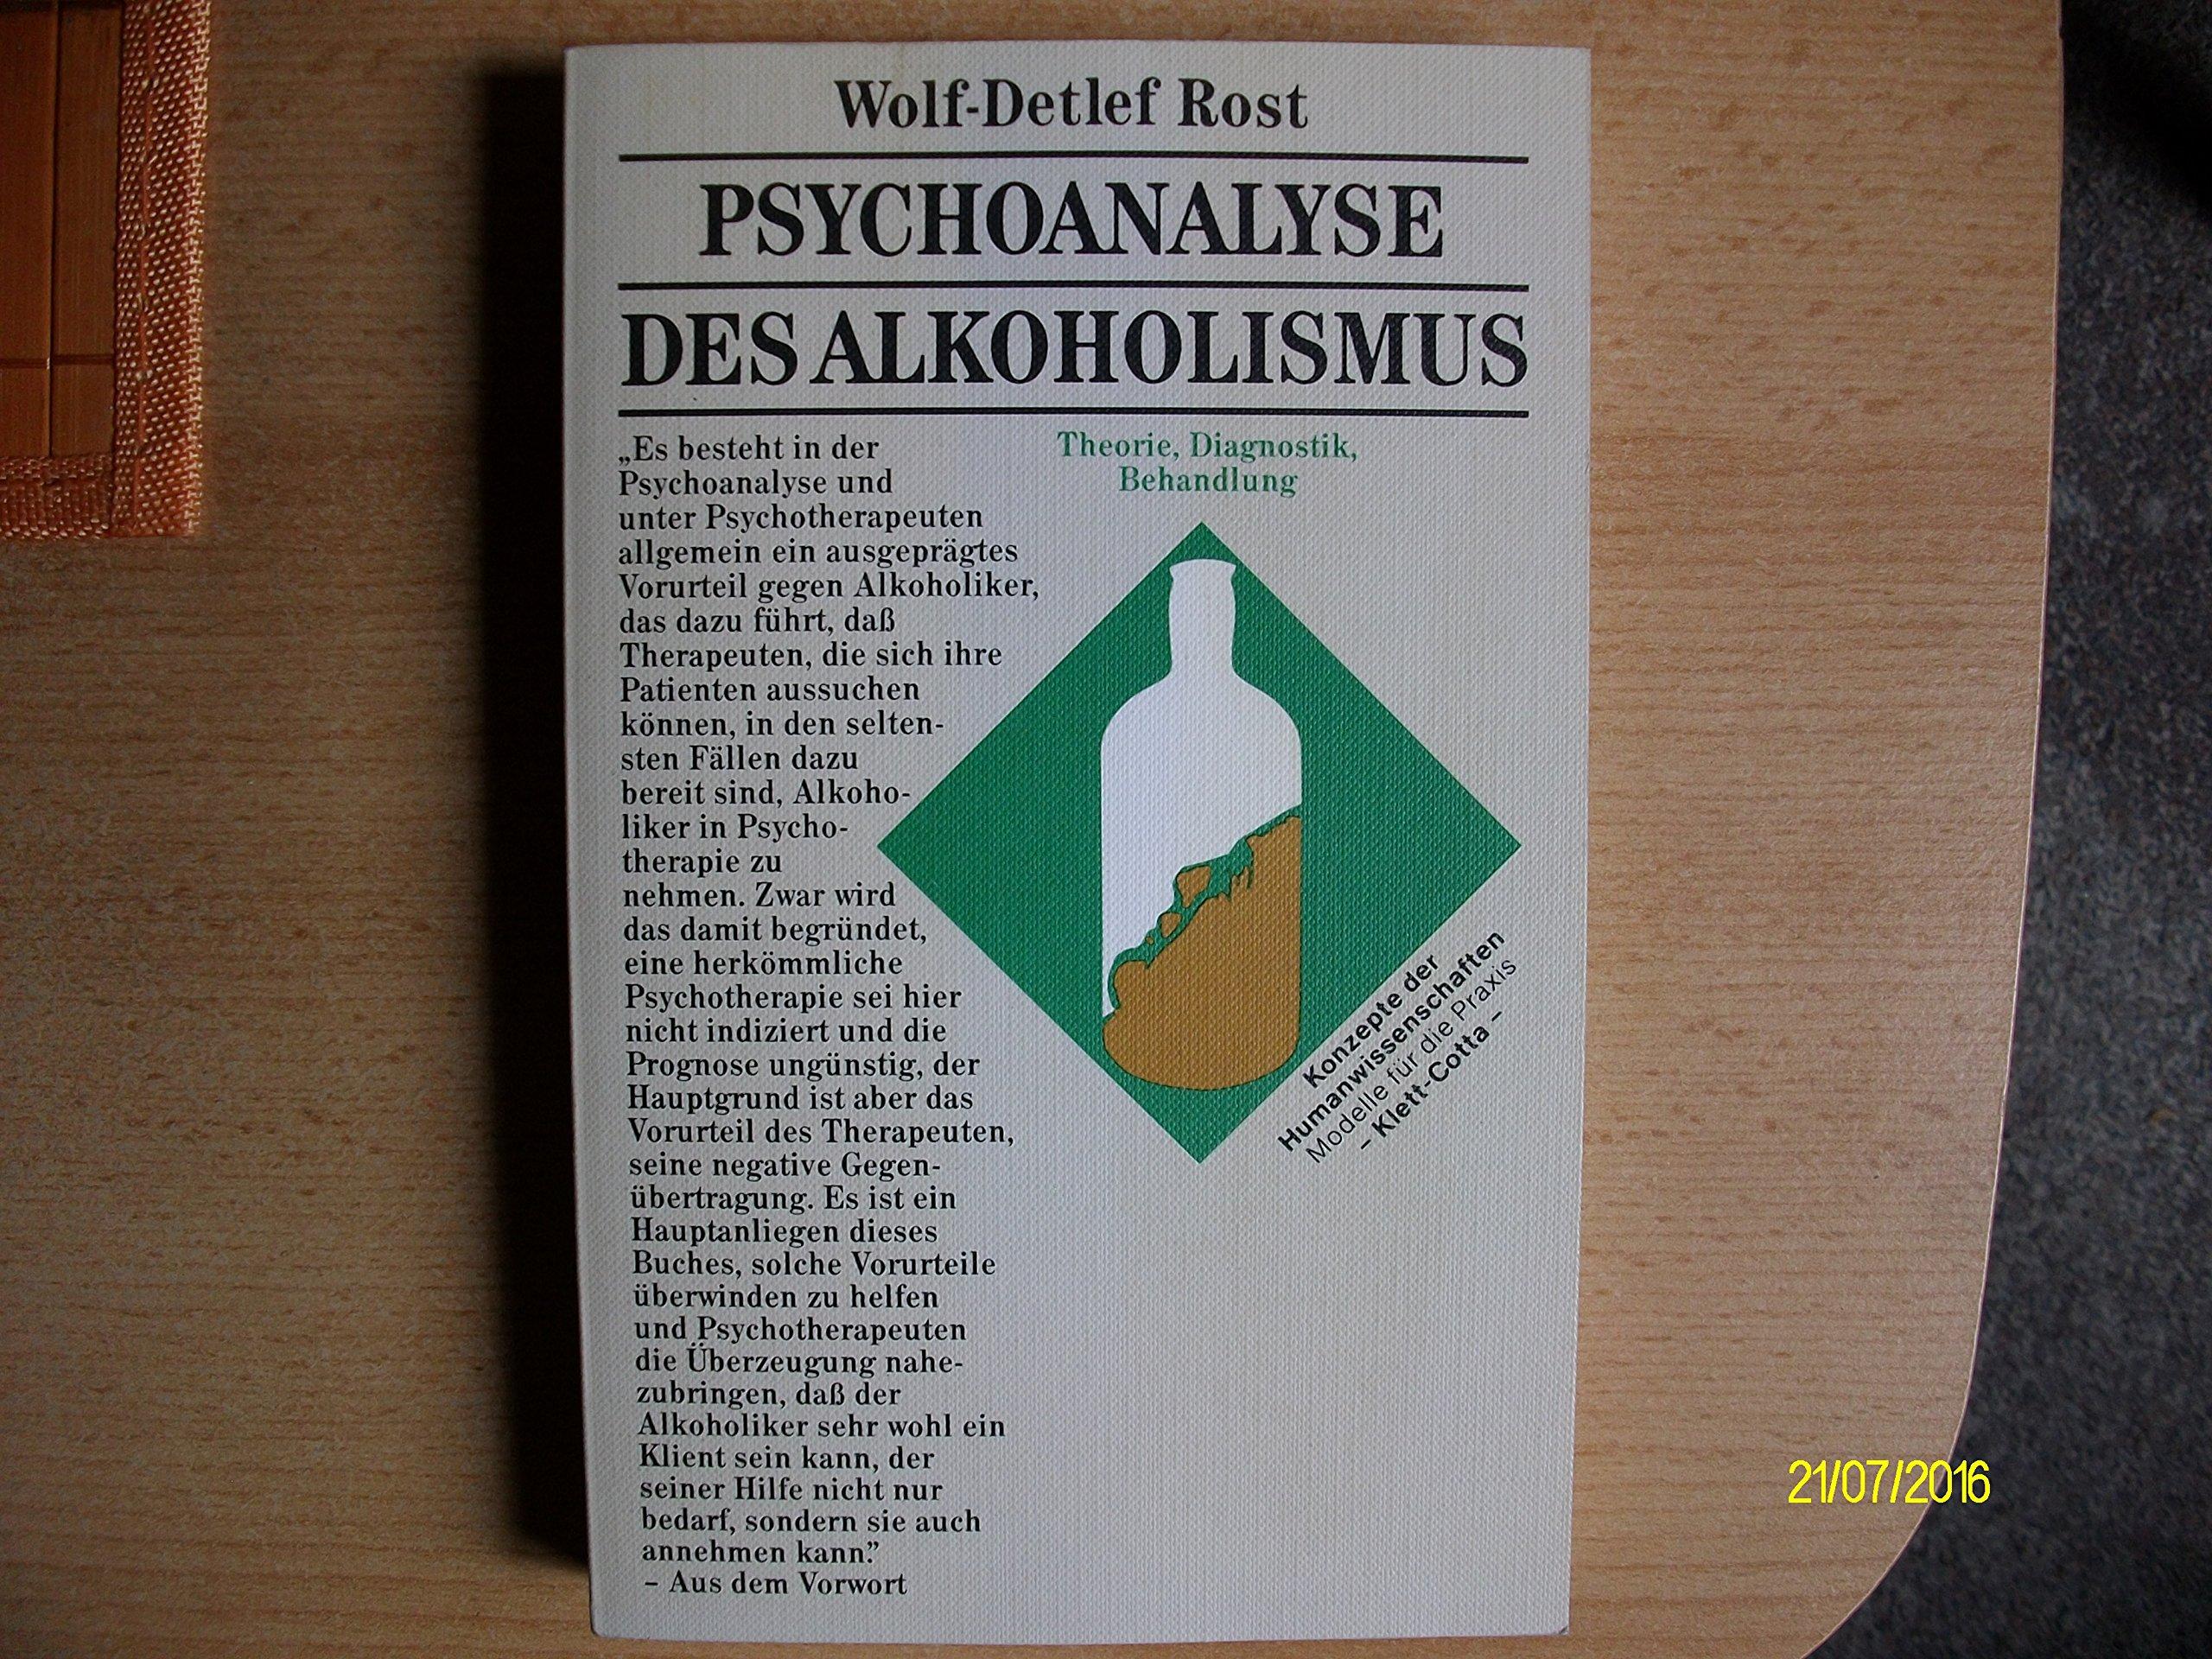 Psychoanalyse des Alkoholismus: Theorie, Diagnostik, Behandlung